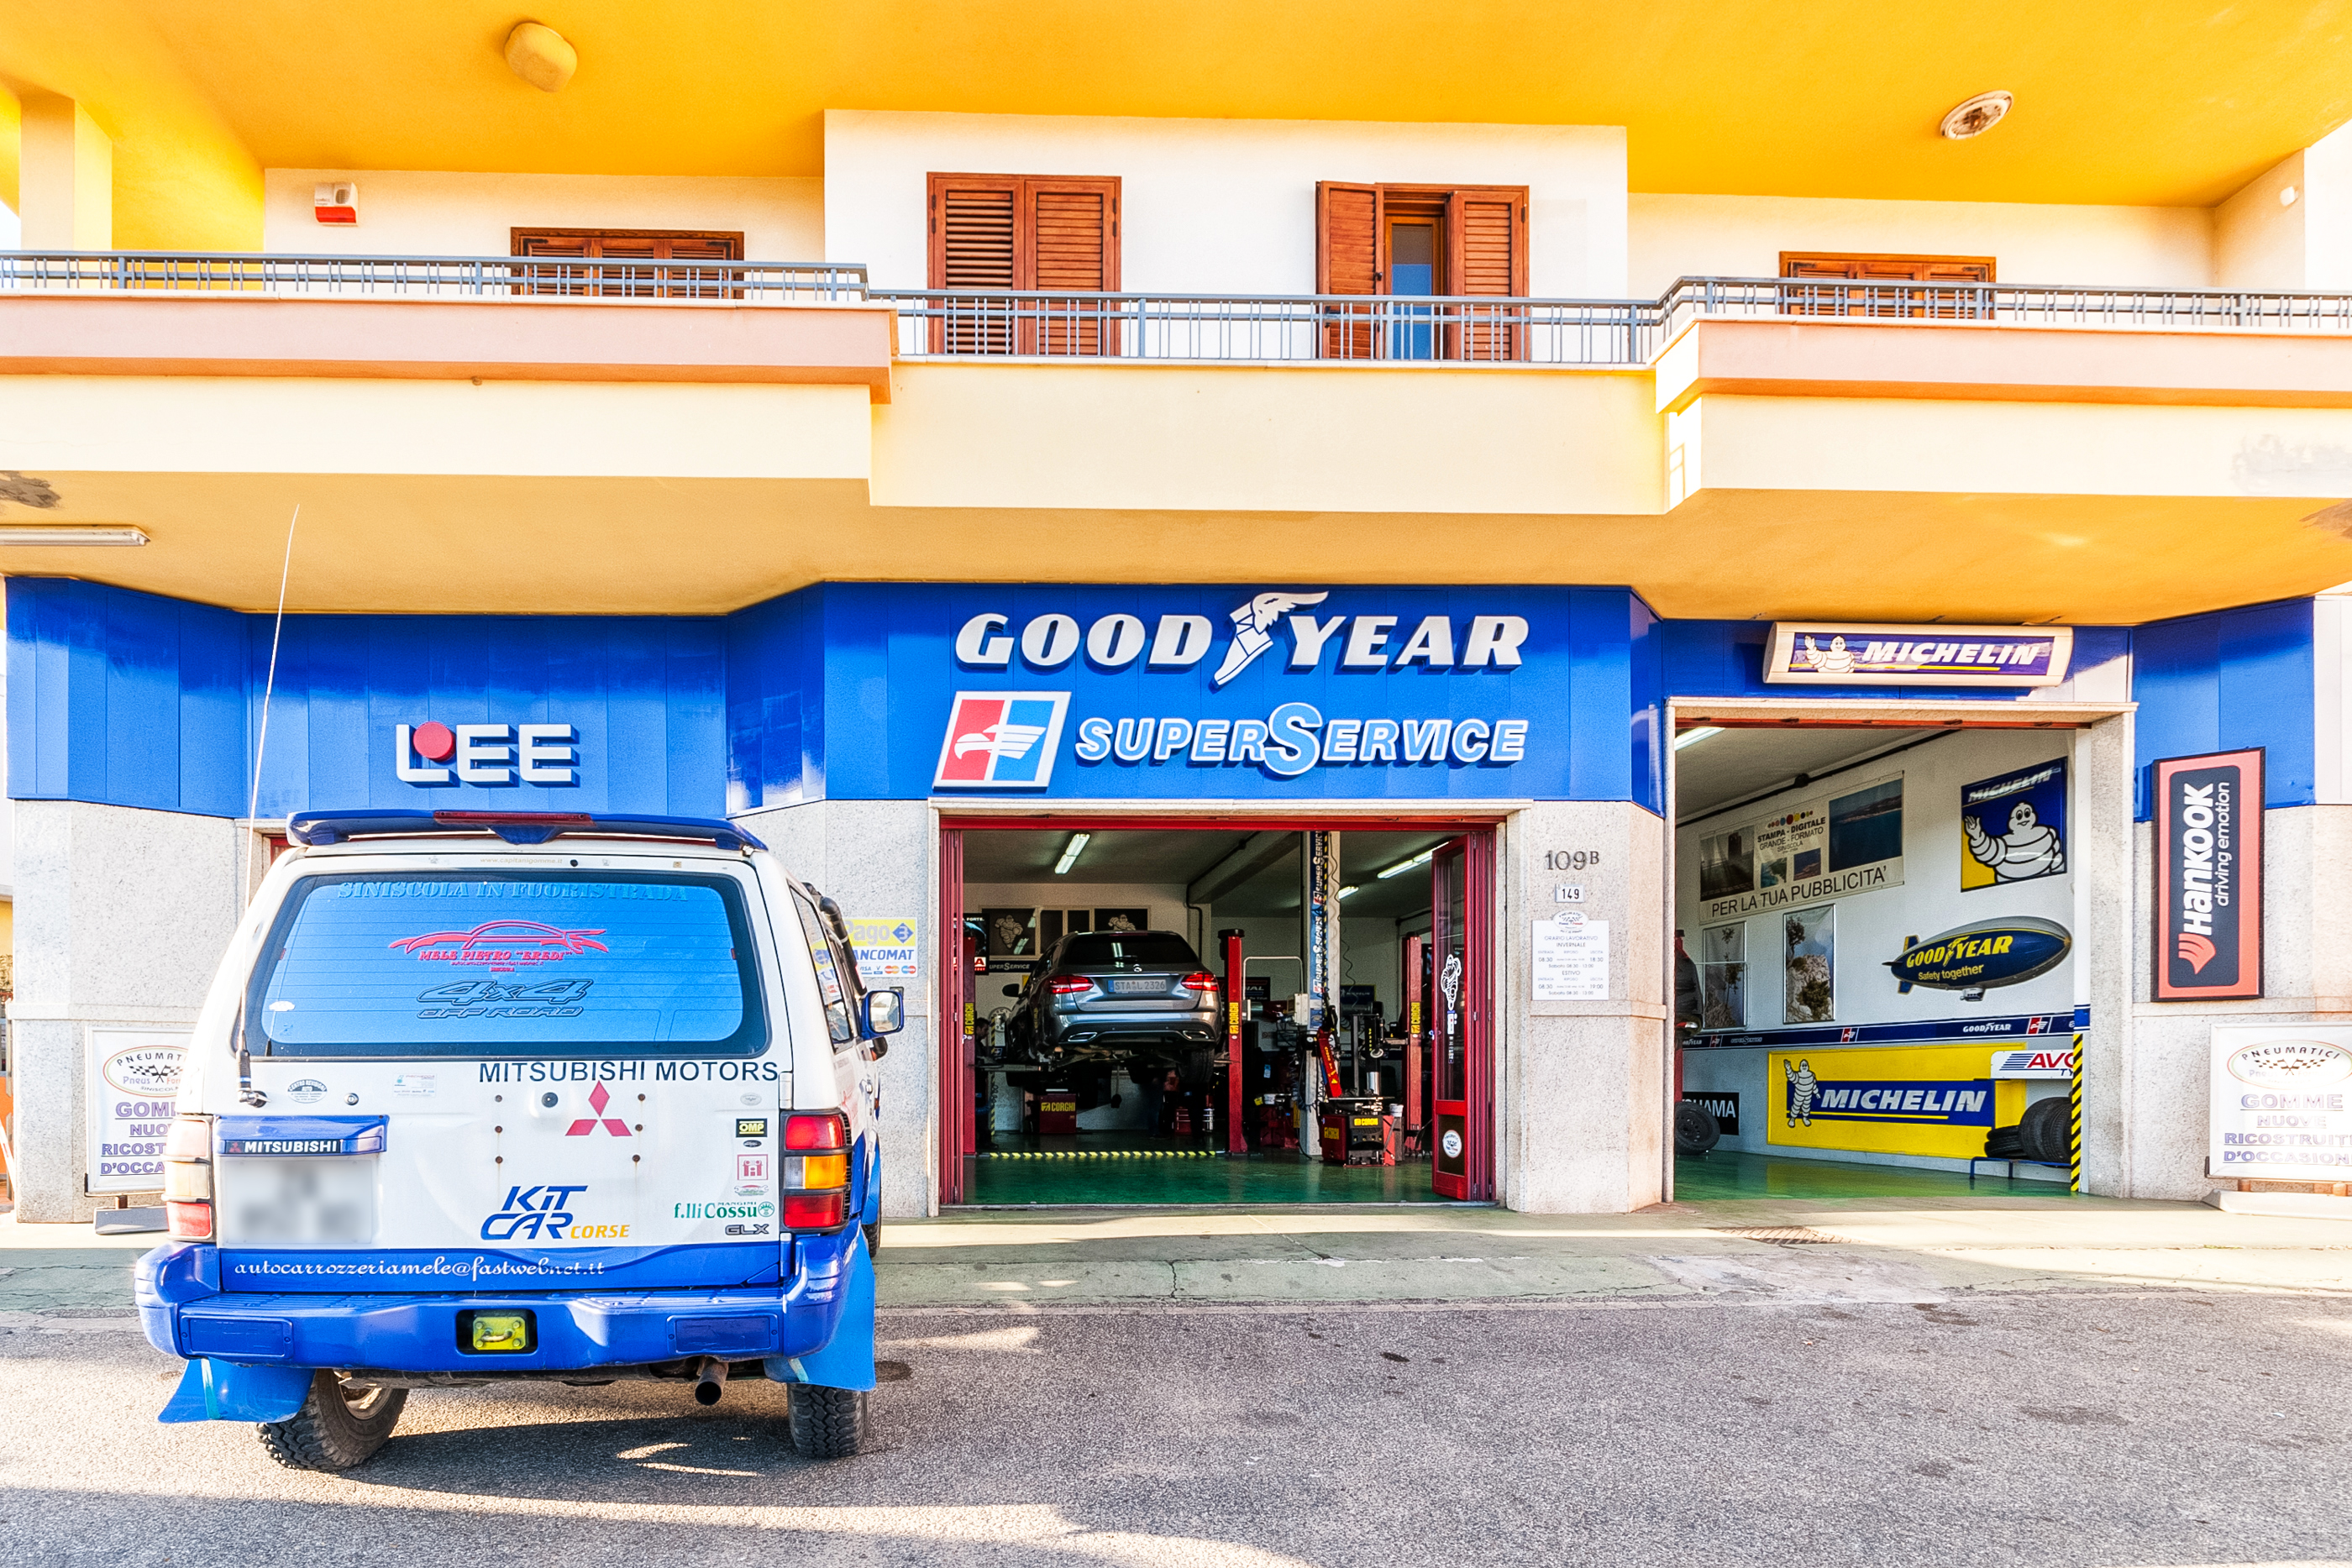 vendita pneumatici nuoro